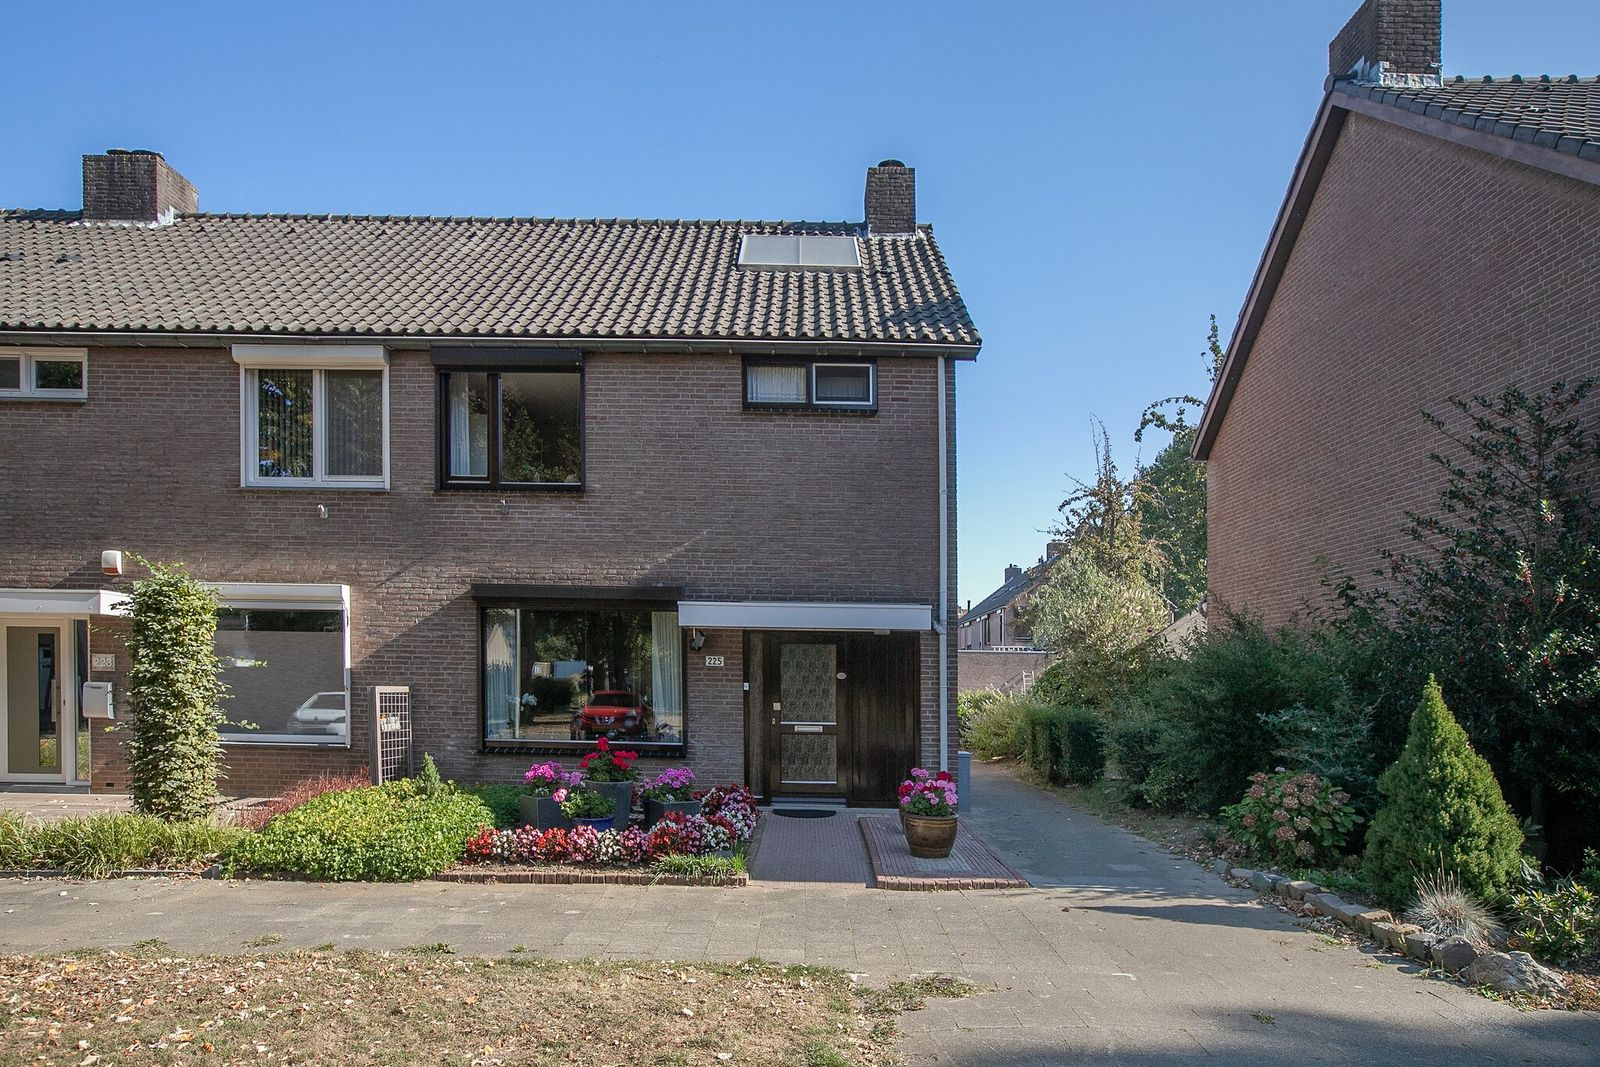 Pergamijndonk 225, Maastricht